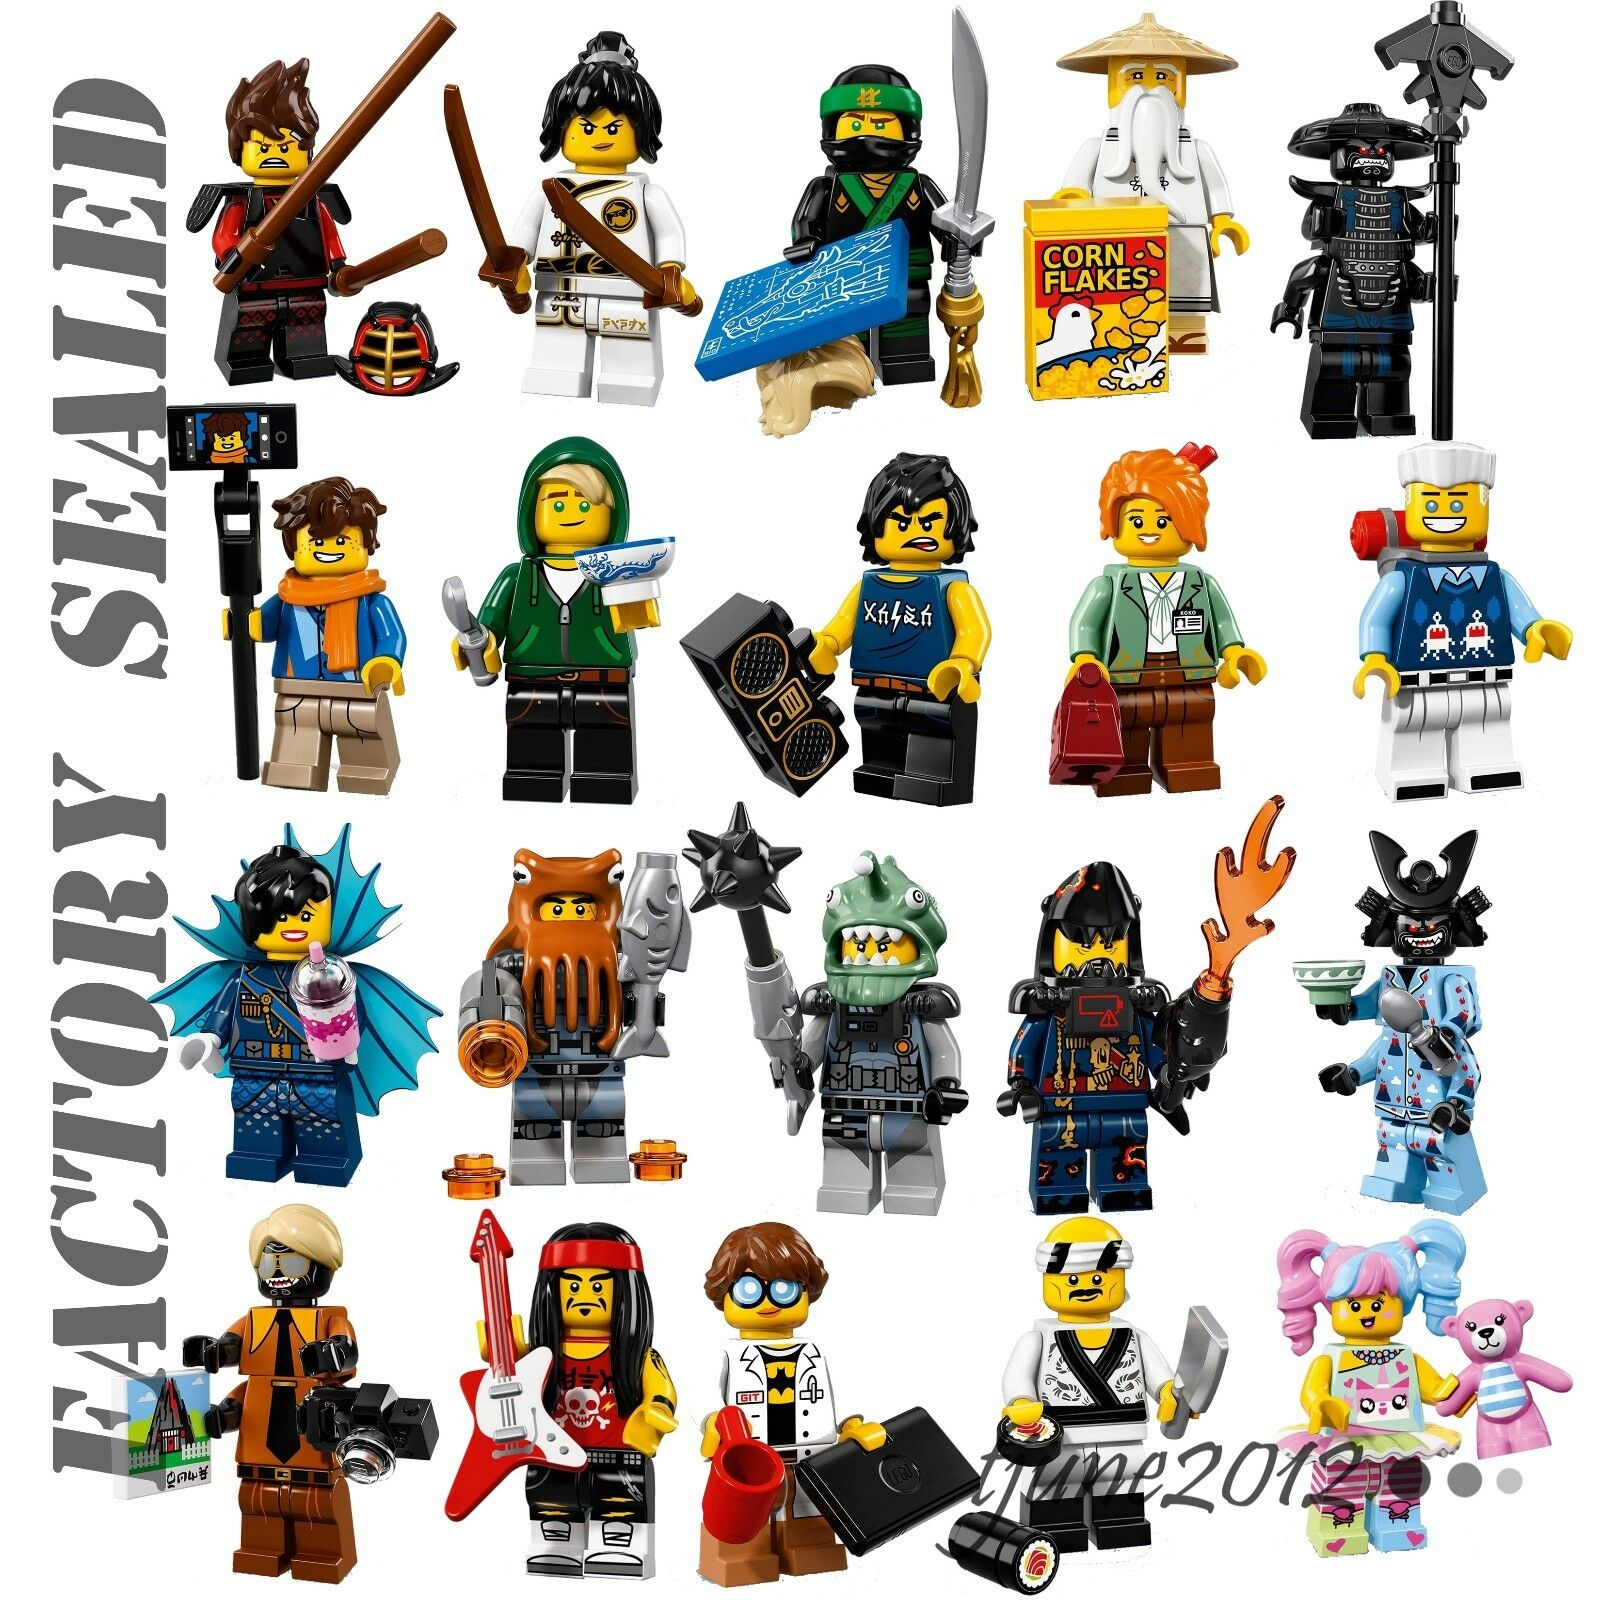 LEGO Ninjago Movie COMPLETE SET OF 20  MINIFIGURES FACTORY SEALED 71019 UNOPENED